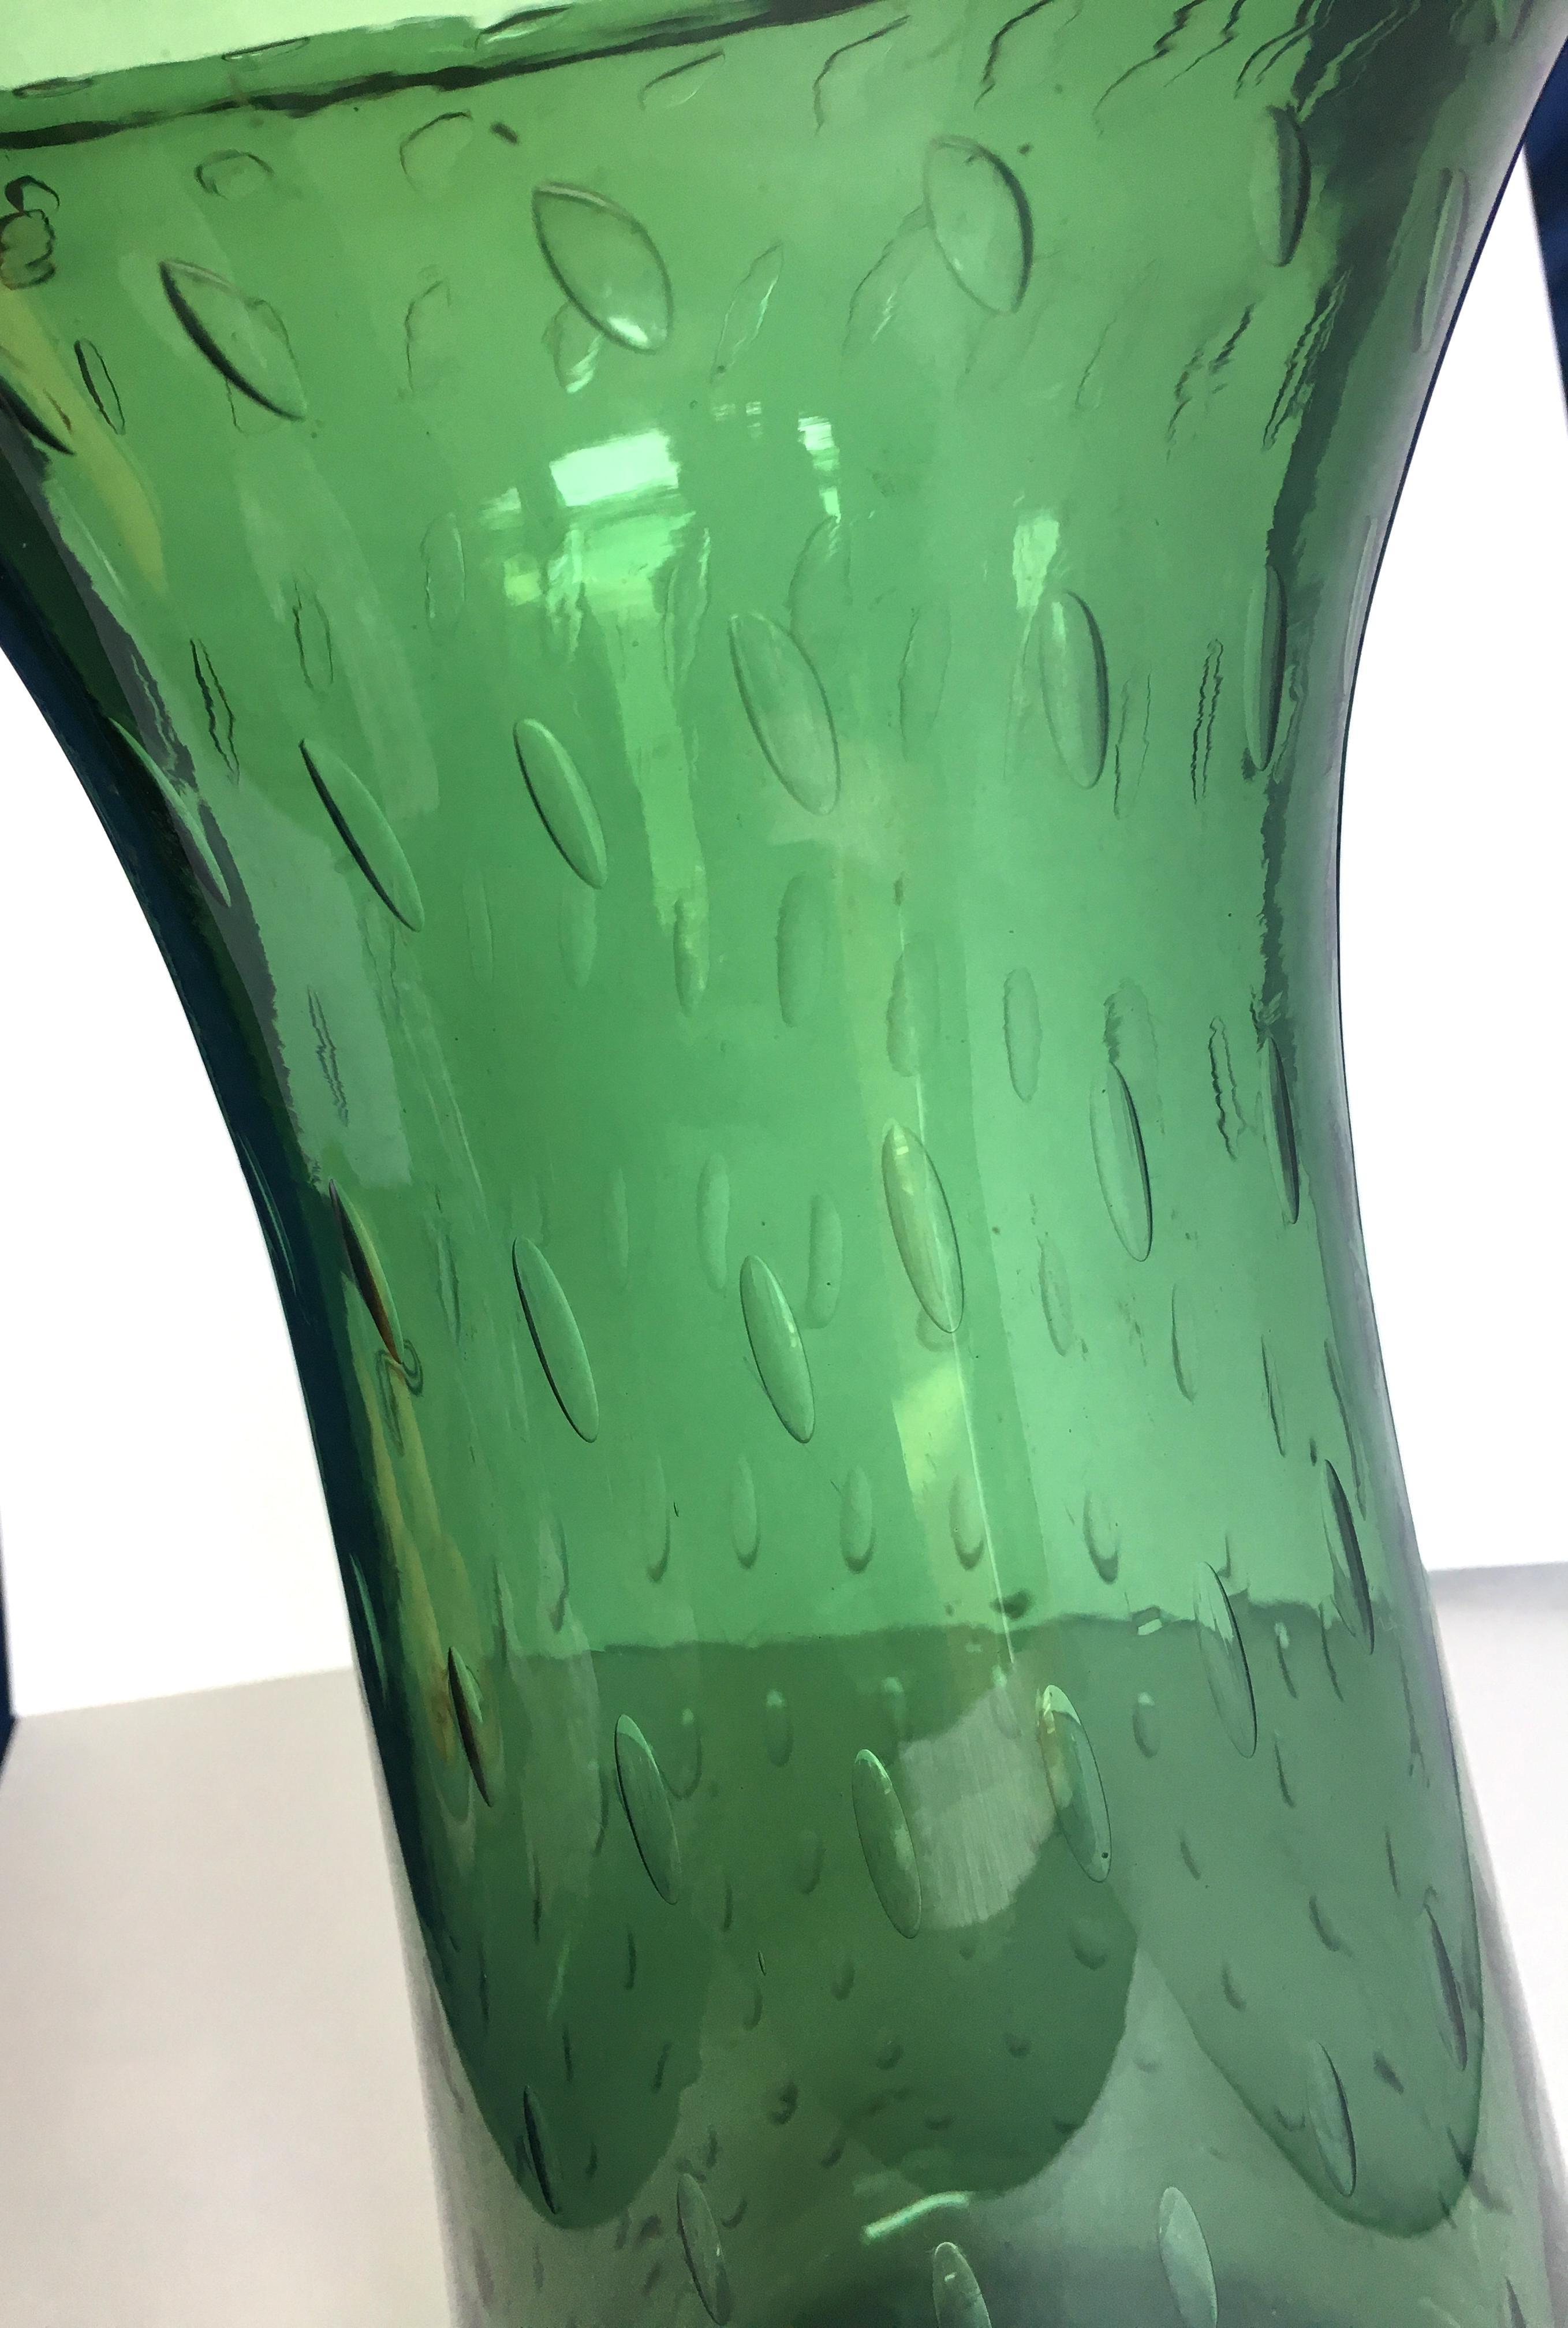 Vintage Blenko Green Controlled Bubble Floor Vase Chairish